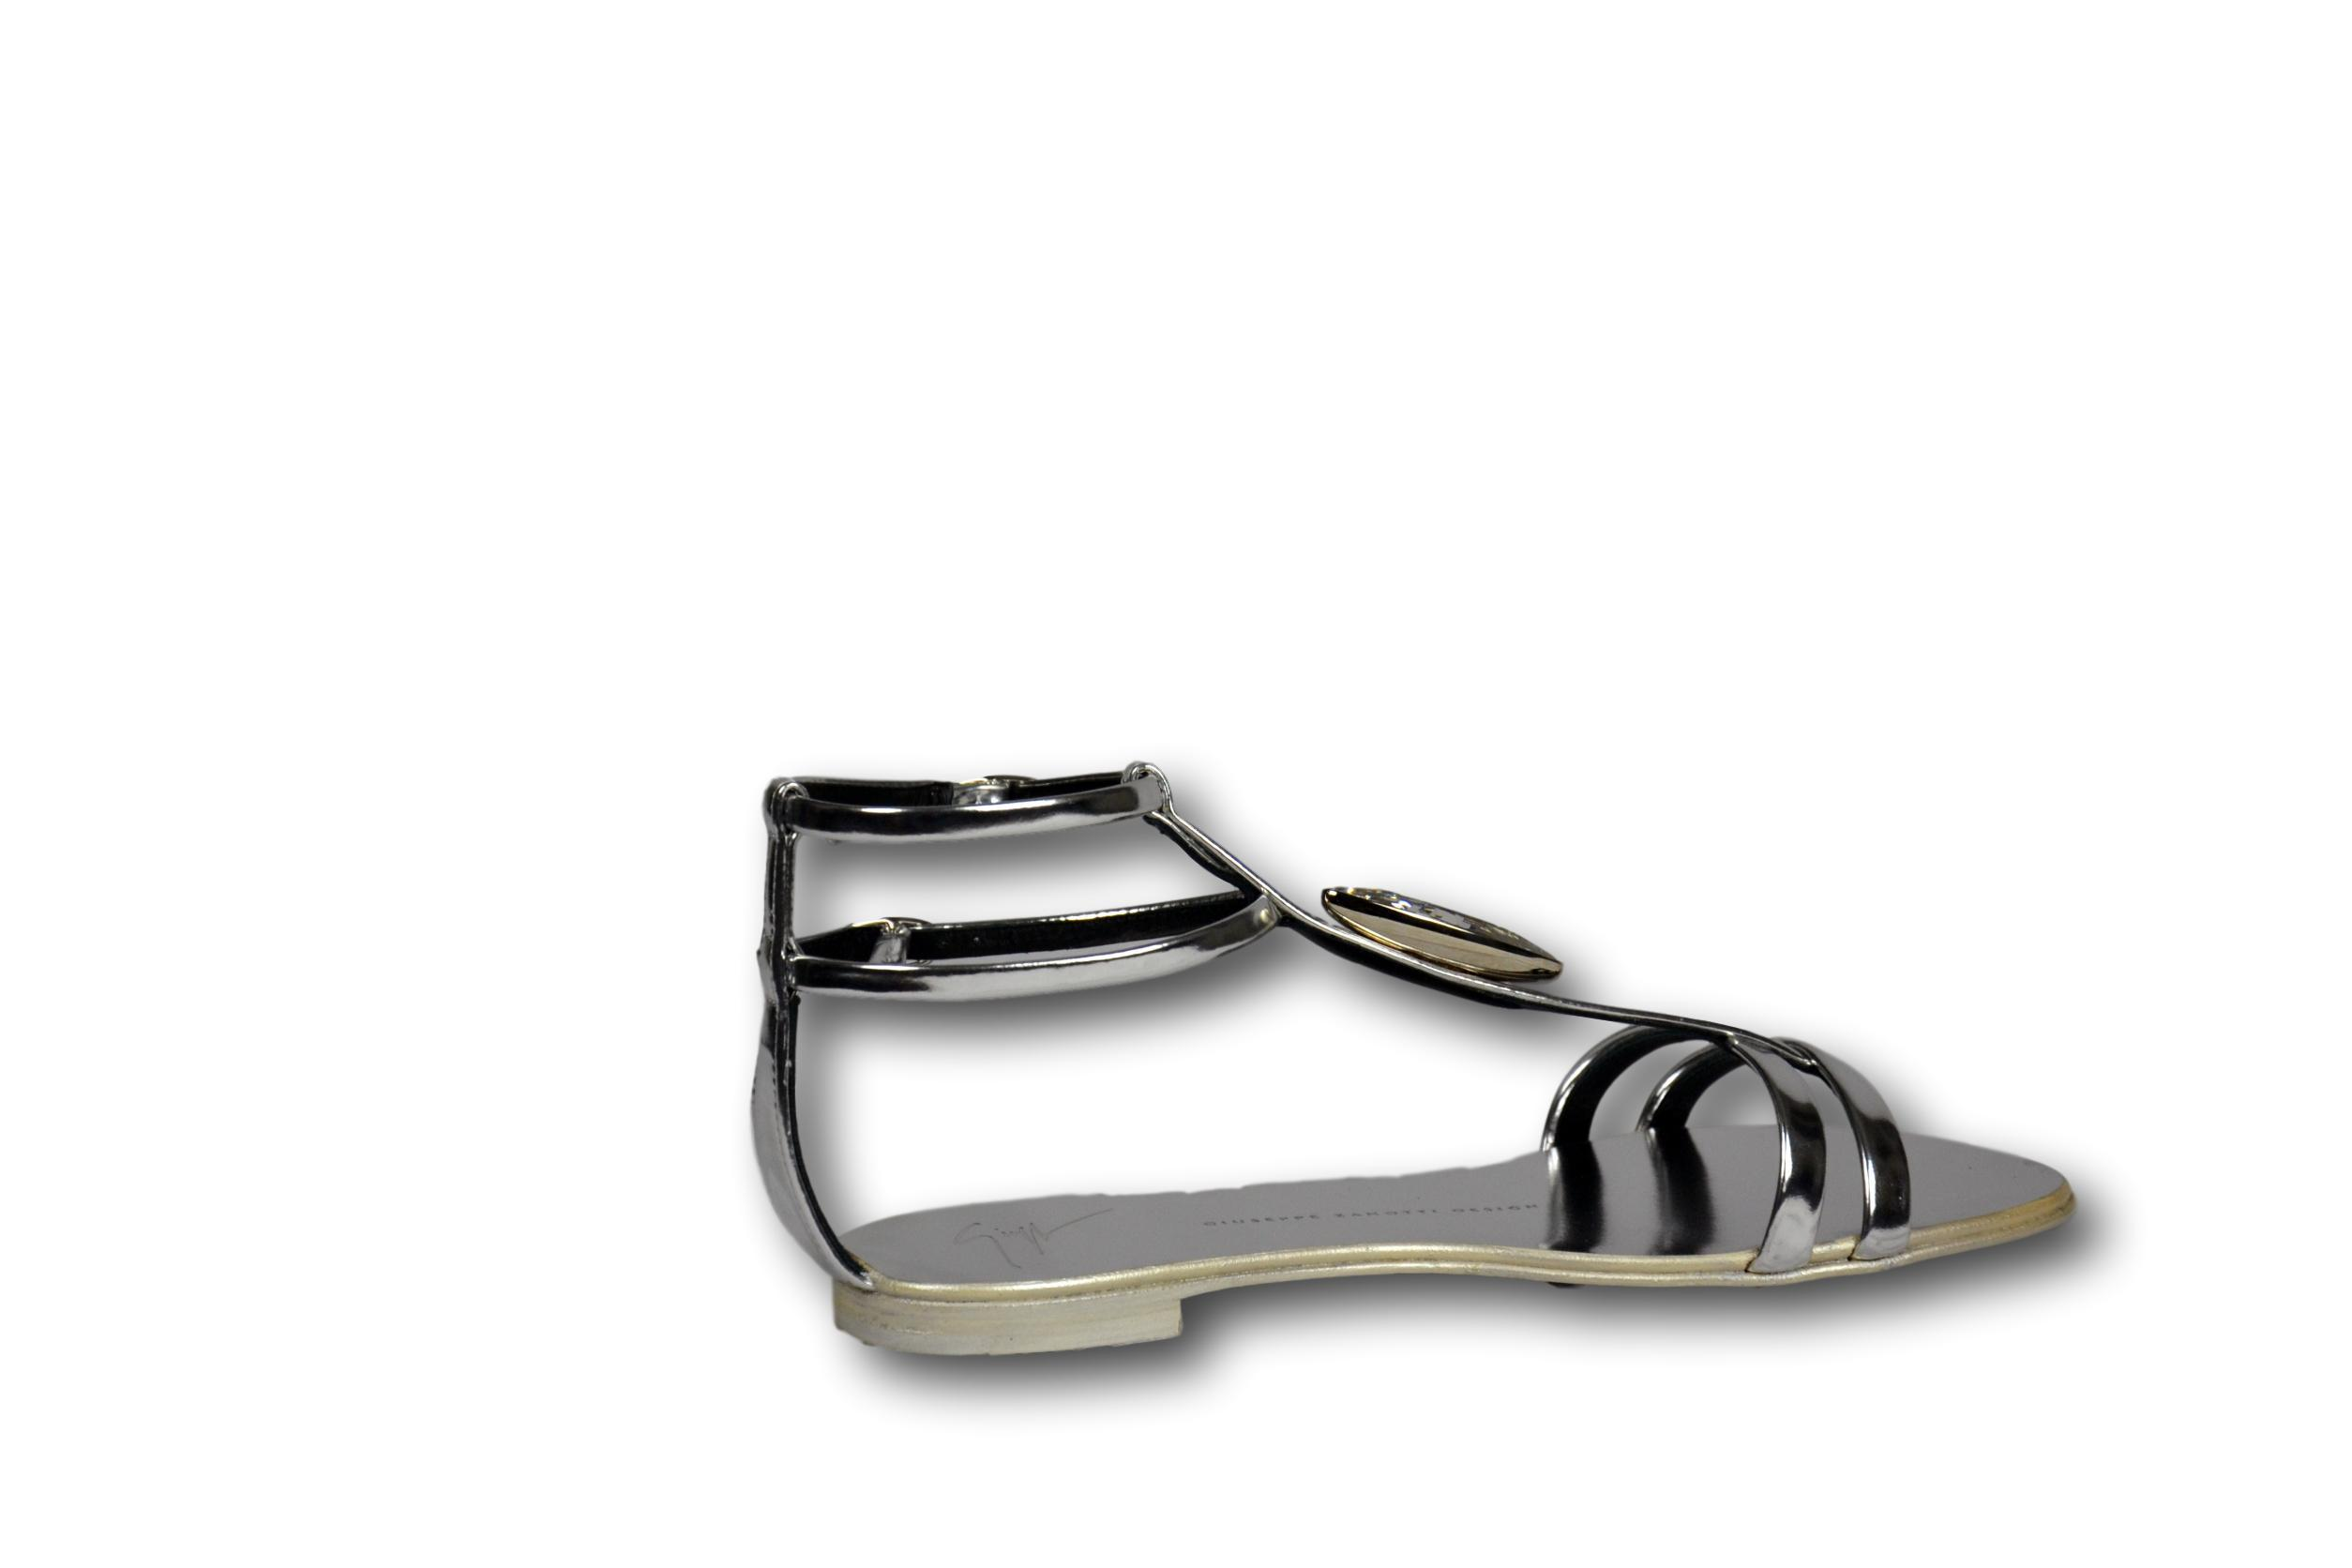 GIUSEPPE ZANOTTI Sandalo Donna Shoes Shooting Cuoio Silver Pietra TG. 37    4 UK 75a3bcc445f